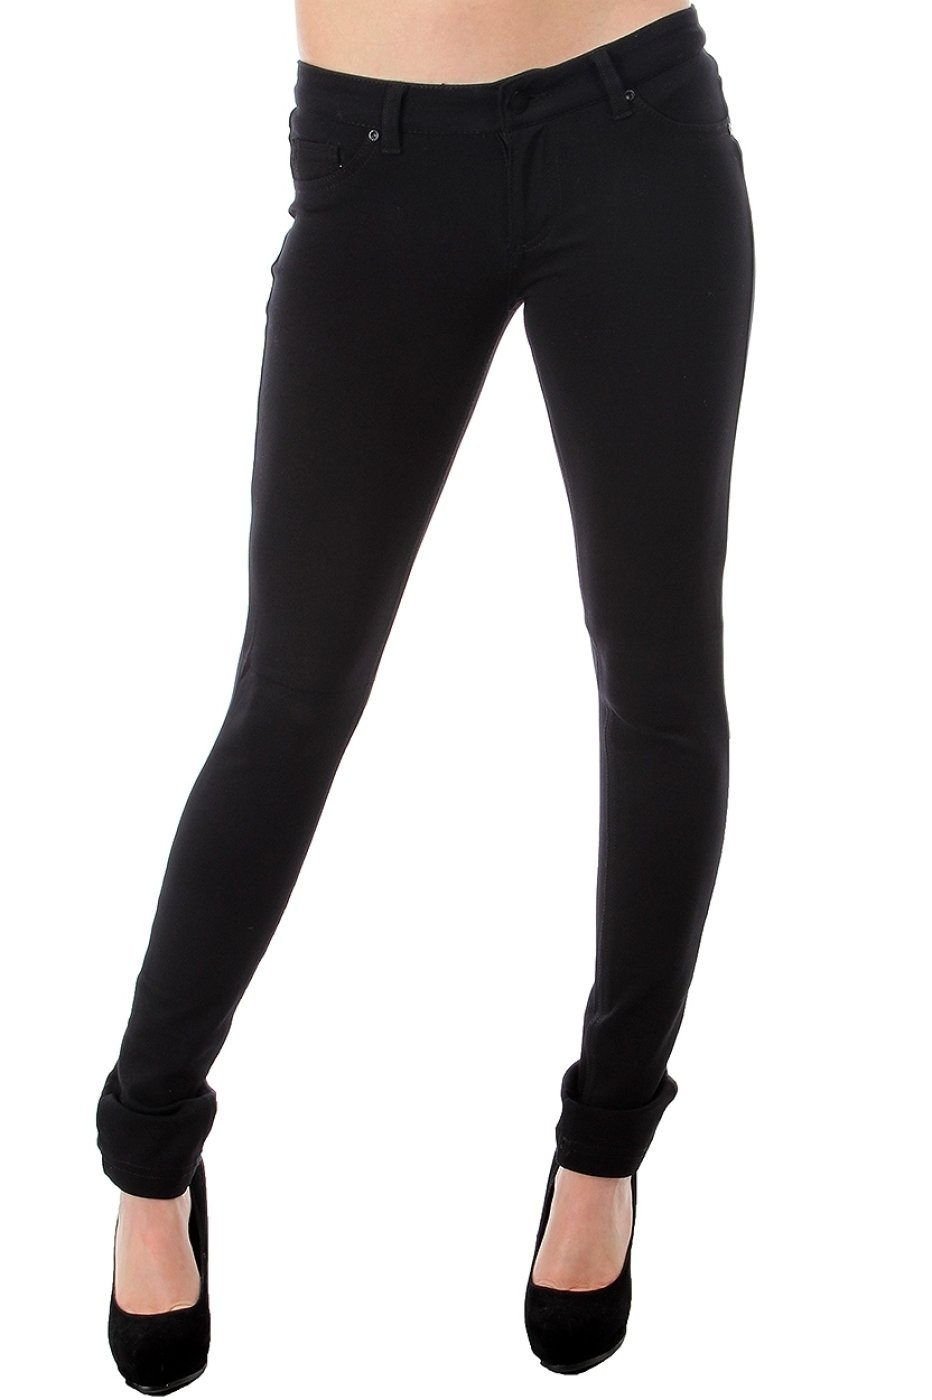 2LUV Women's Low Rise Ponte Stretch Skinny Pants Black L(P9128)